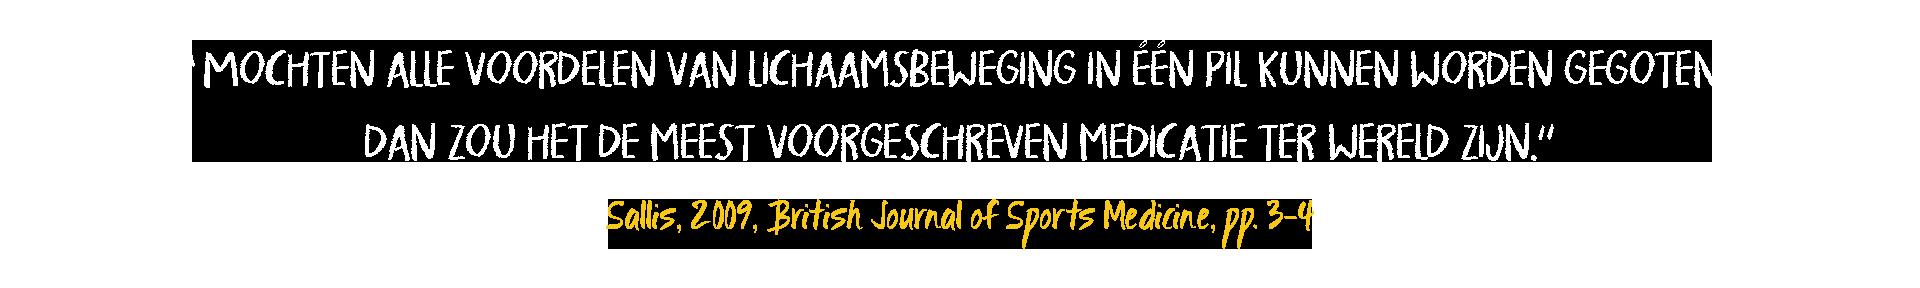 GS_Site_MC_BannerPhrase_NL